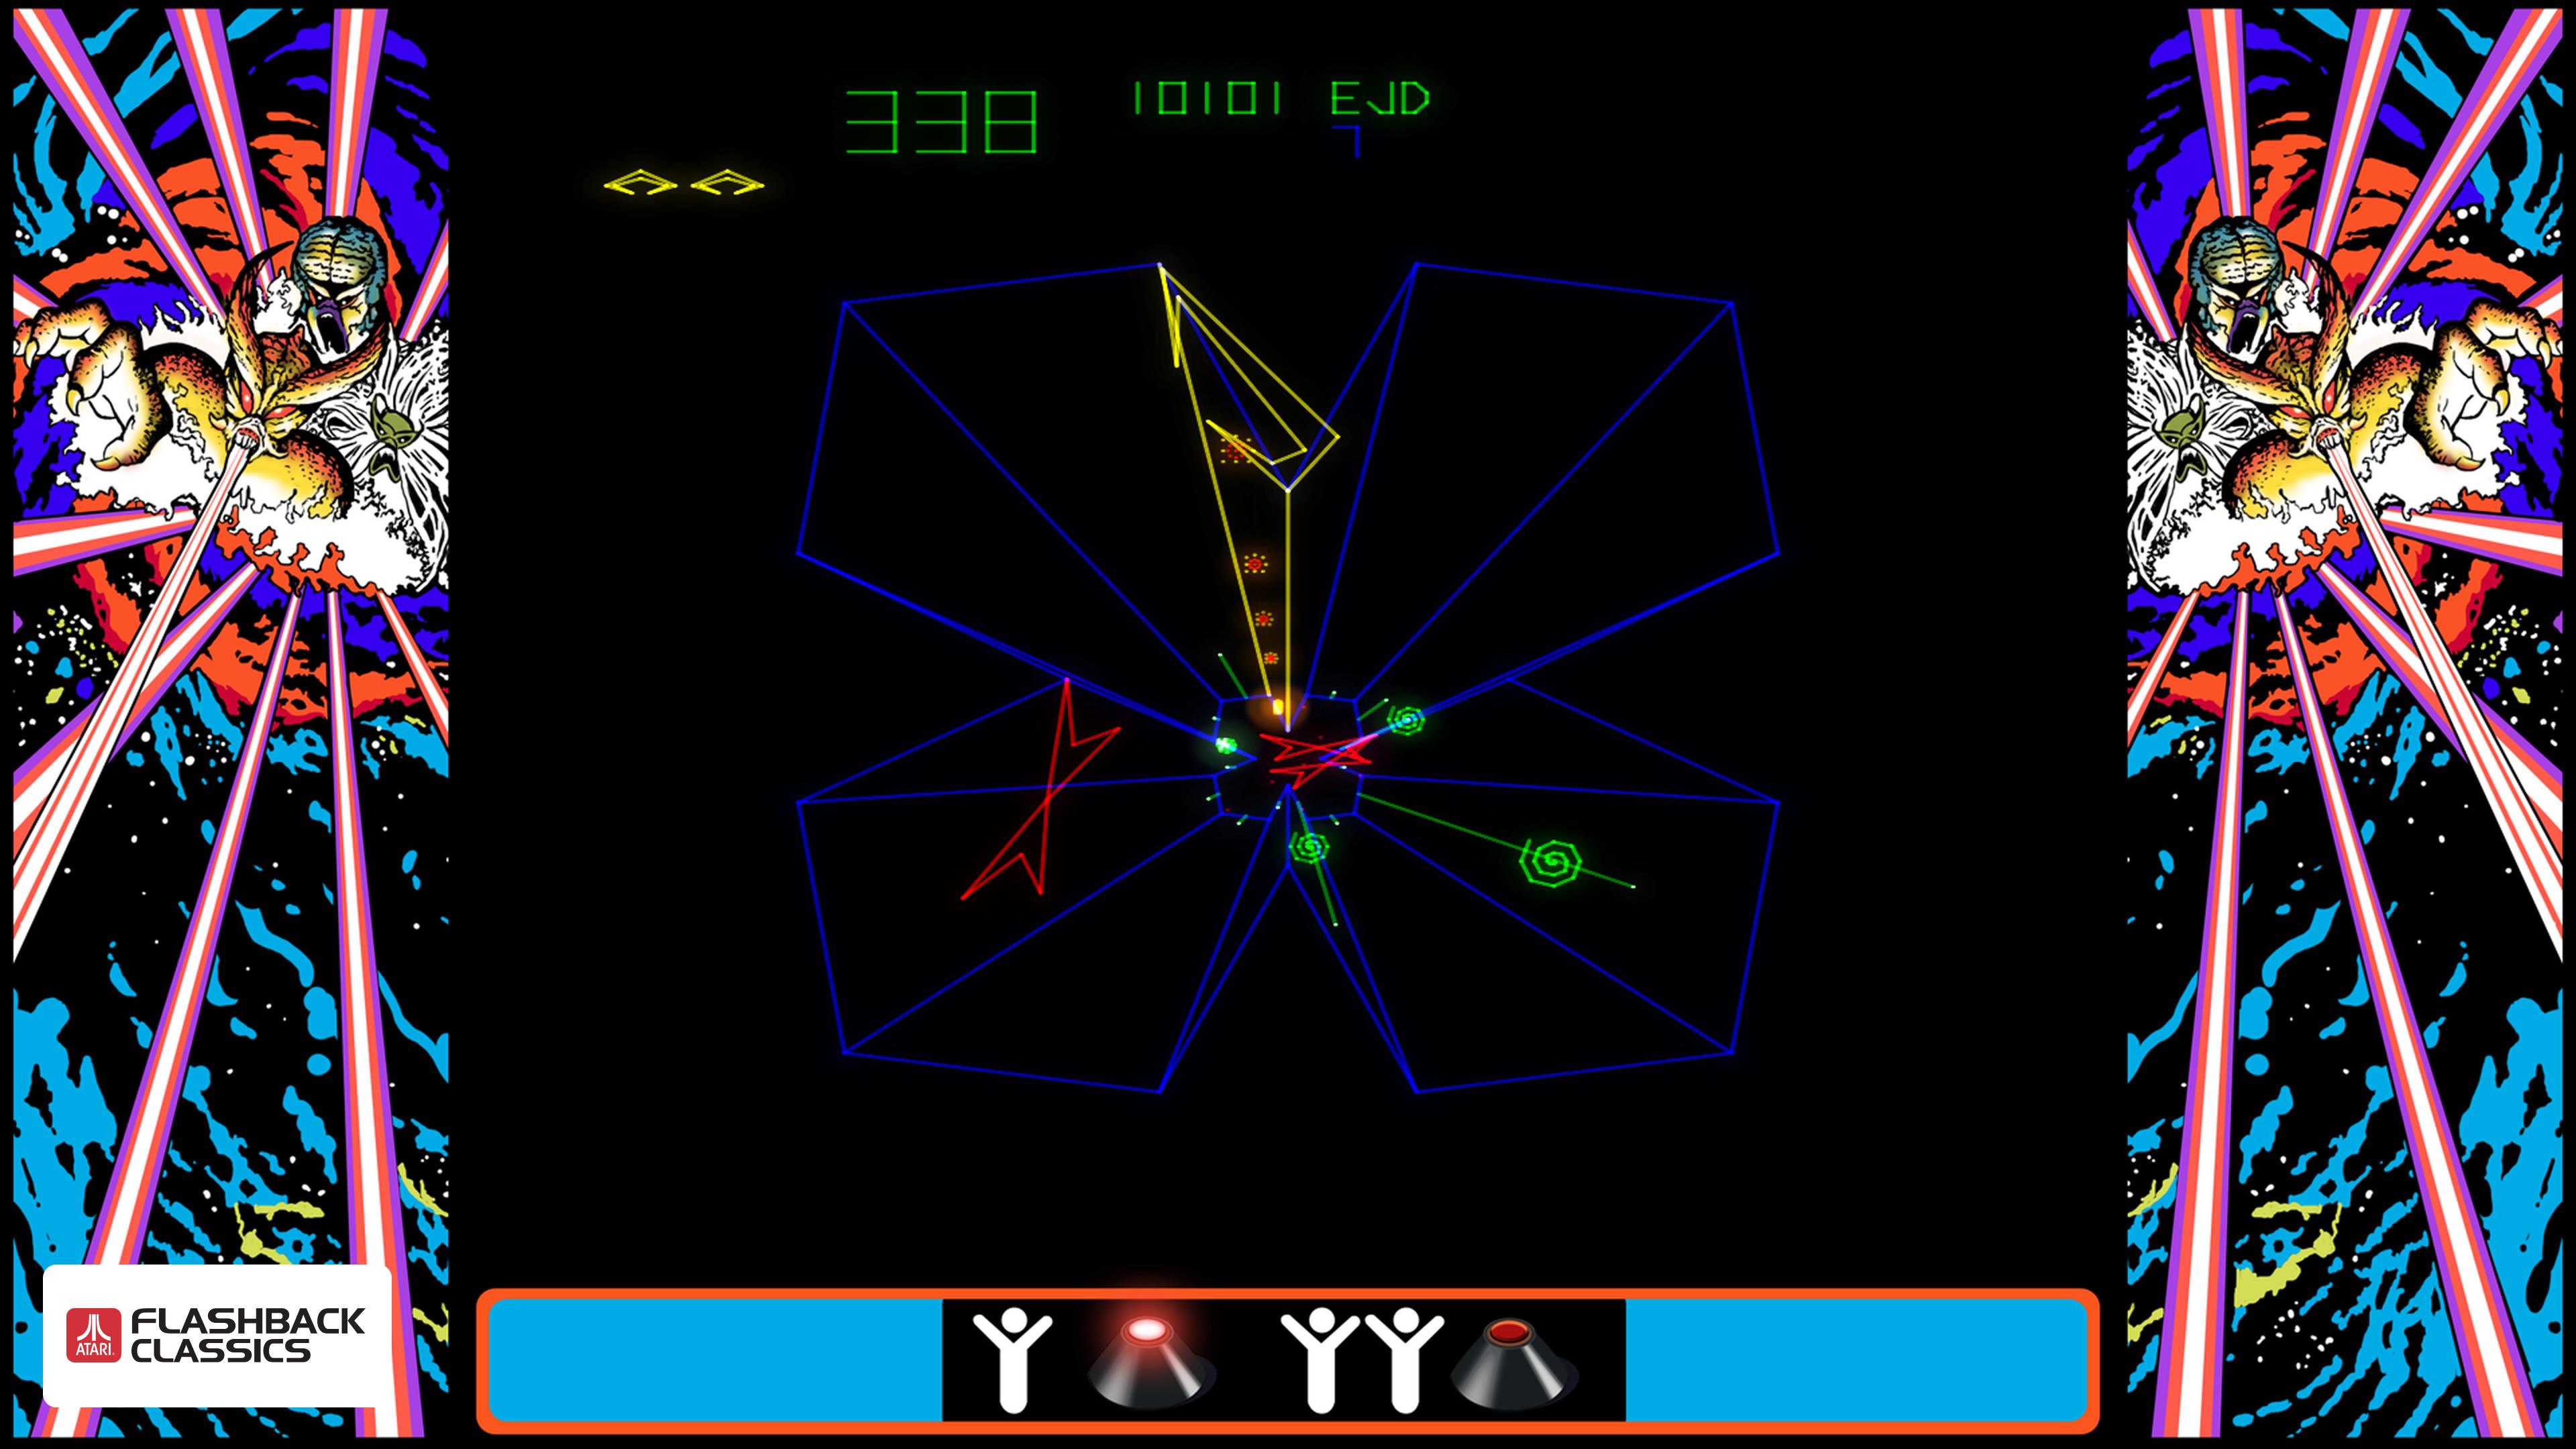 Atari Flashback Classics Volume 1 Review Tempest PS4